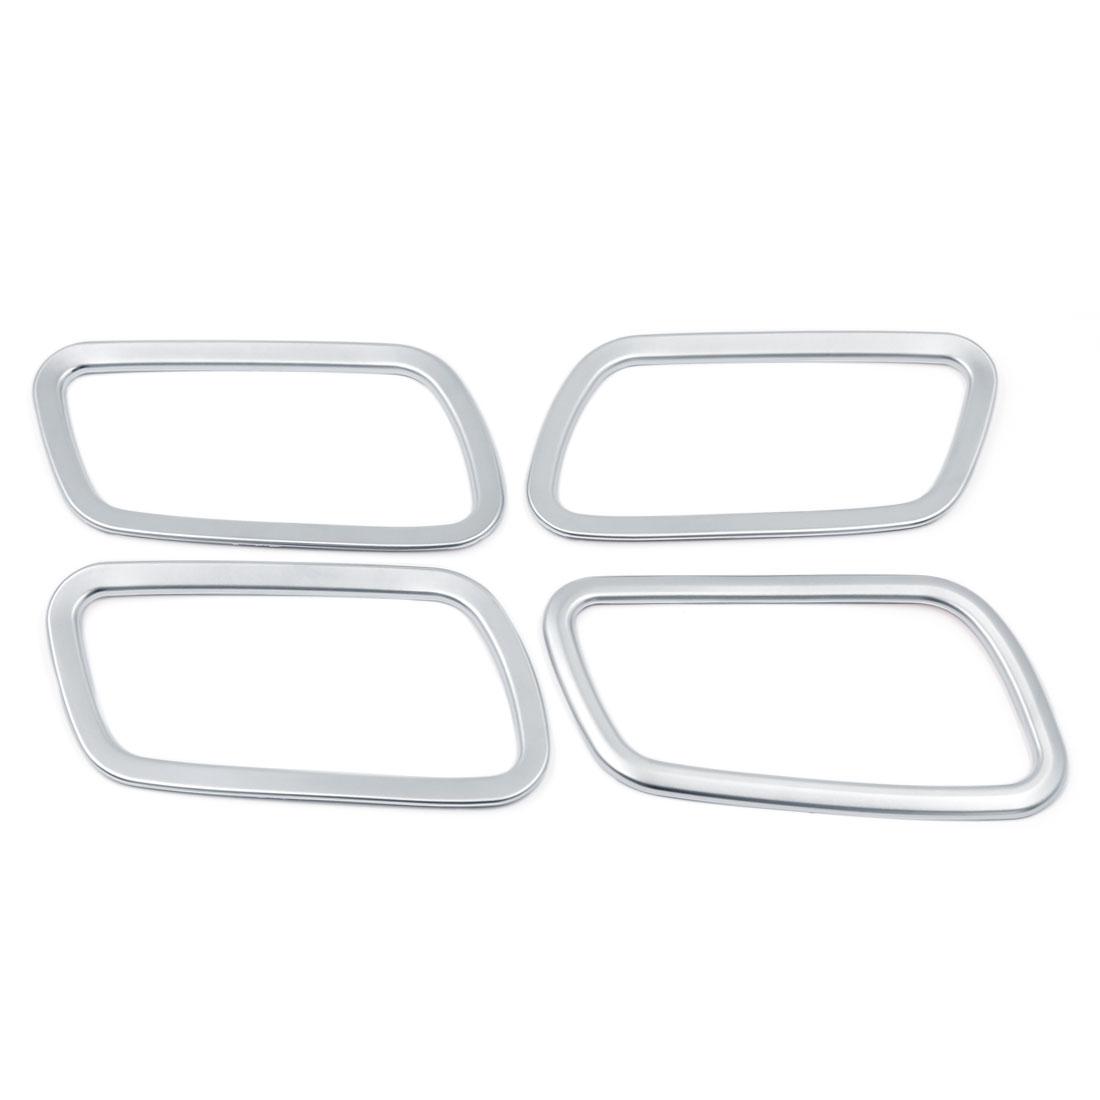 4 Pcs Chrome Car Inner Door Handle Bowl Frame Cover Trim for Honda CRV CR-V 2014